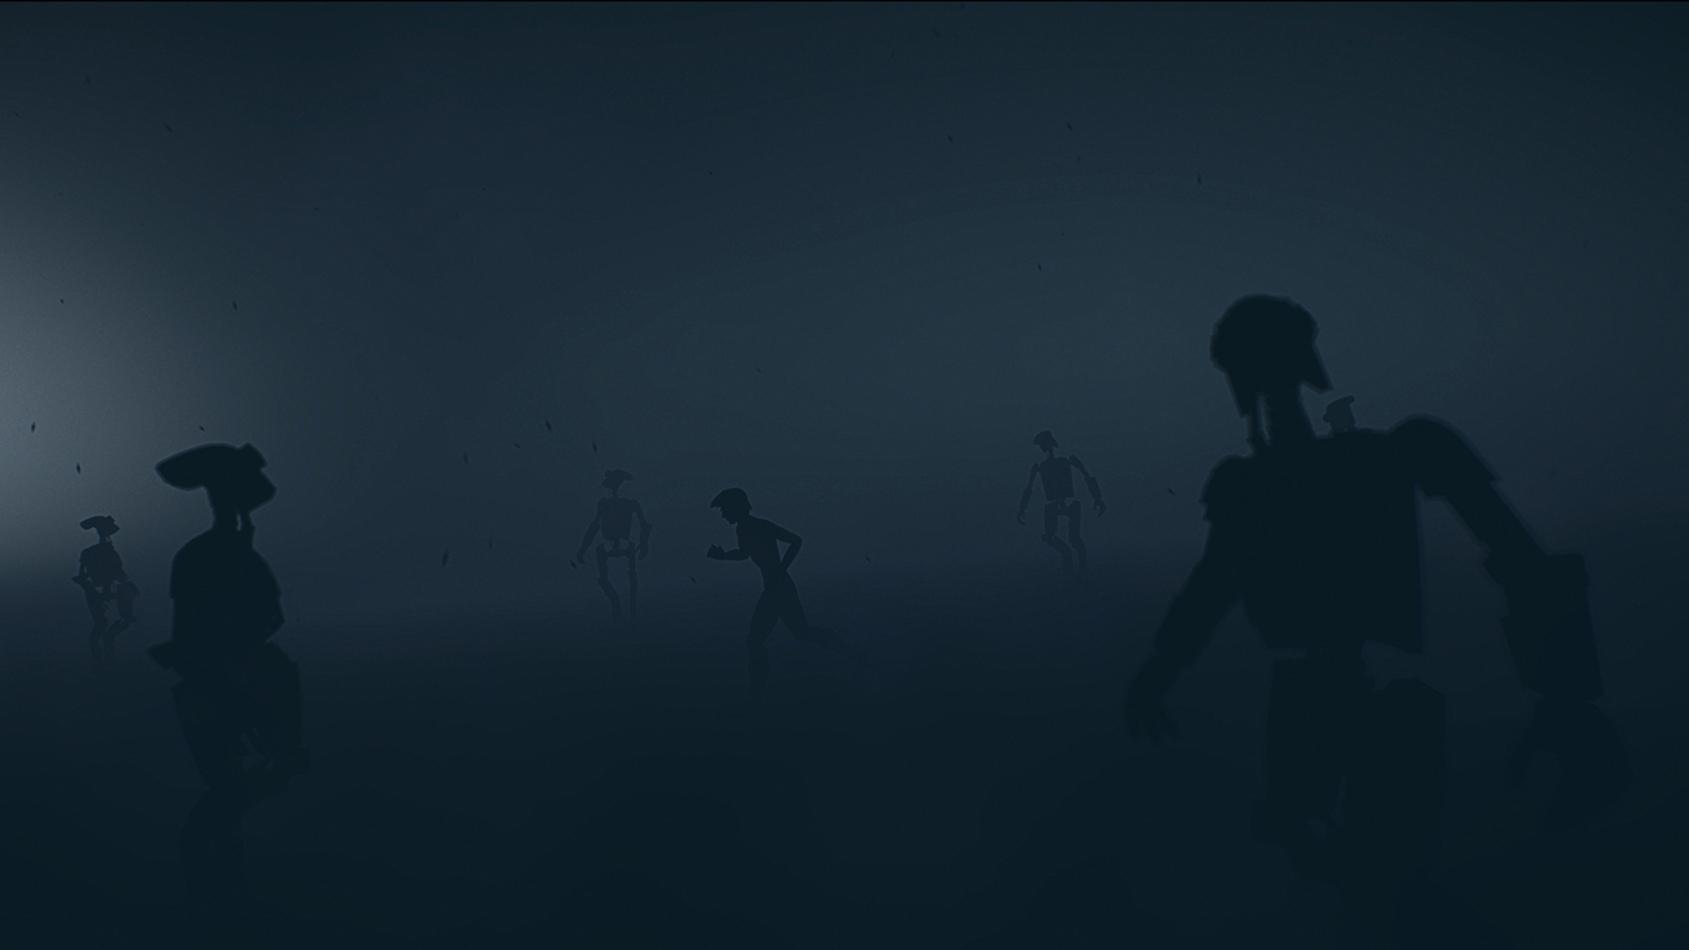 Hra 7th Sector oznámena pro konzole